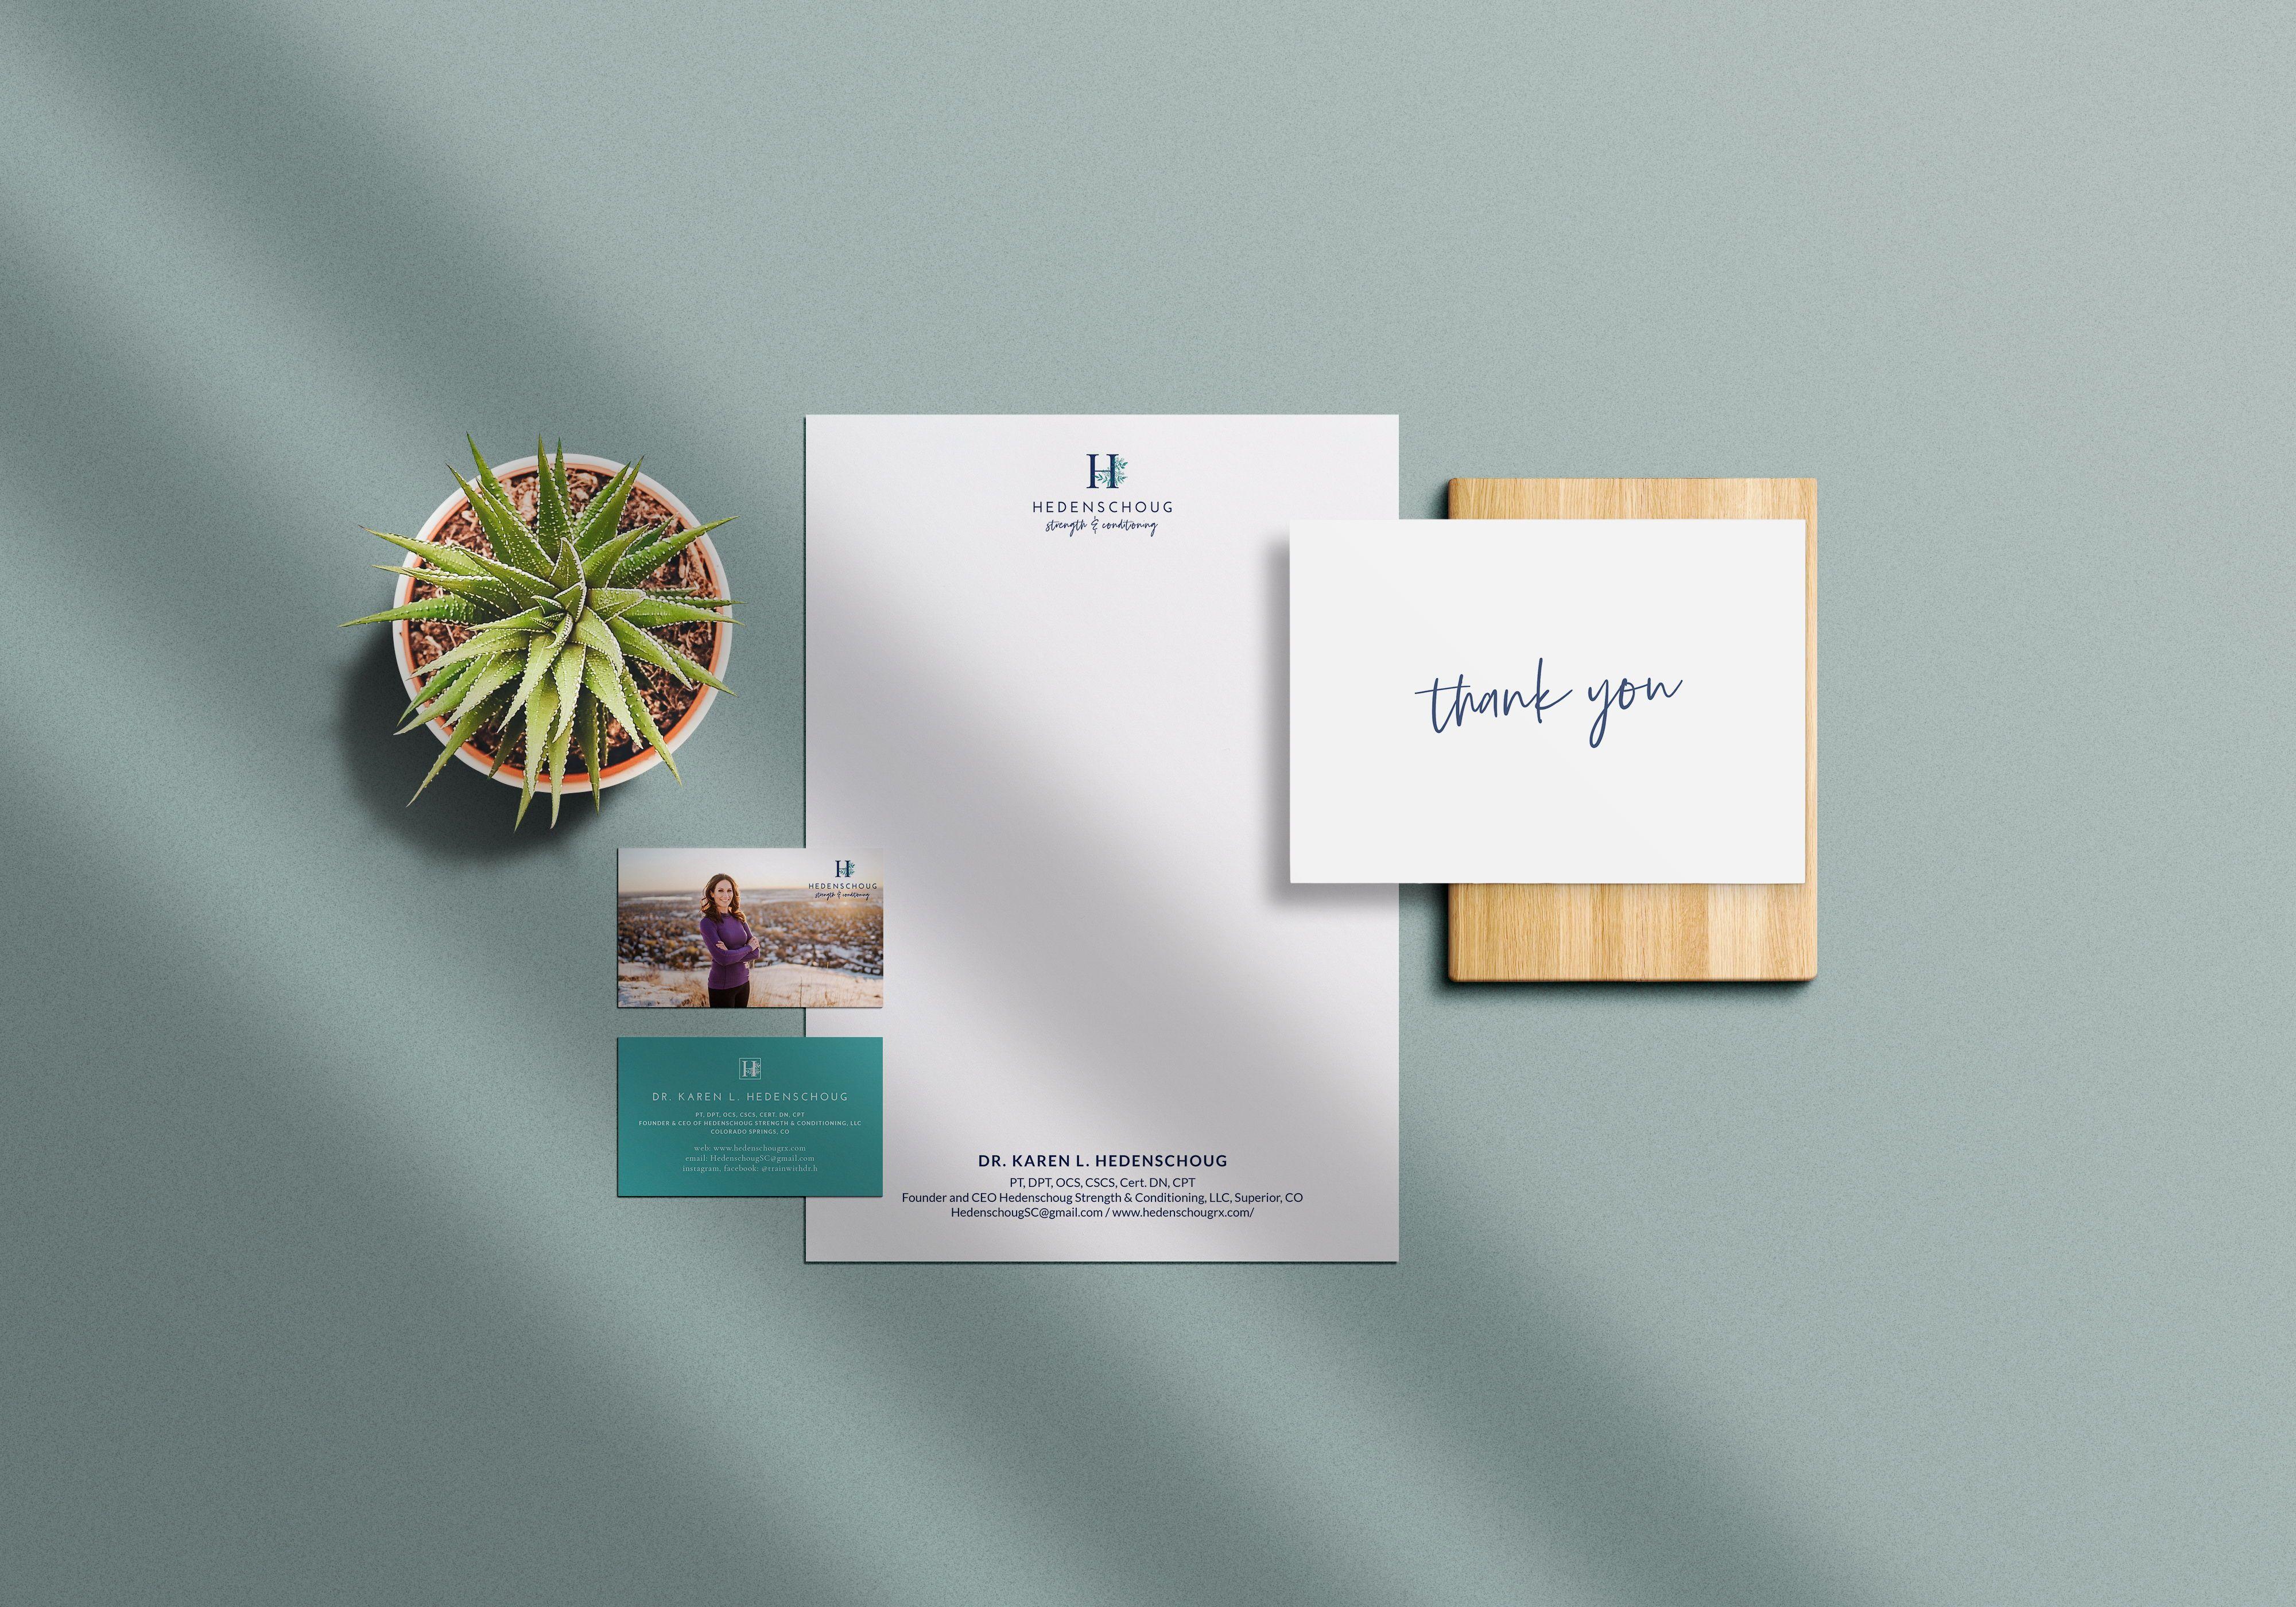 Heartfelt Web Designs Branding For Female Creatives Viva La Violet In 2020 Web Design Beautiful Branding Brand Stylist